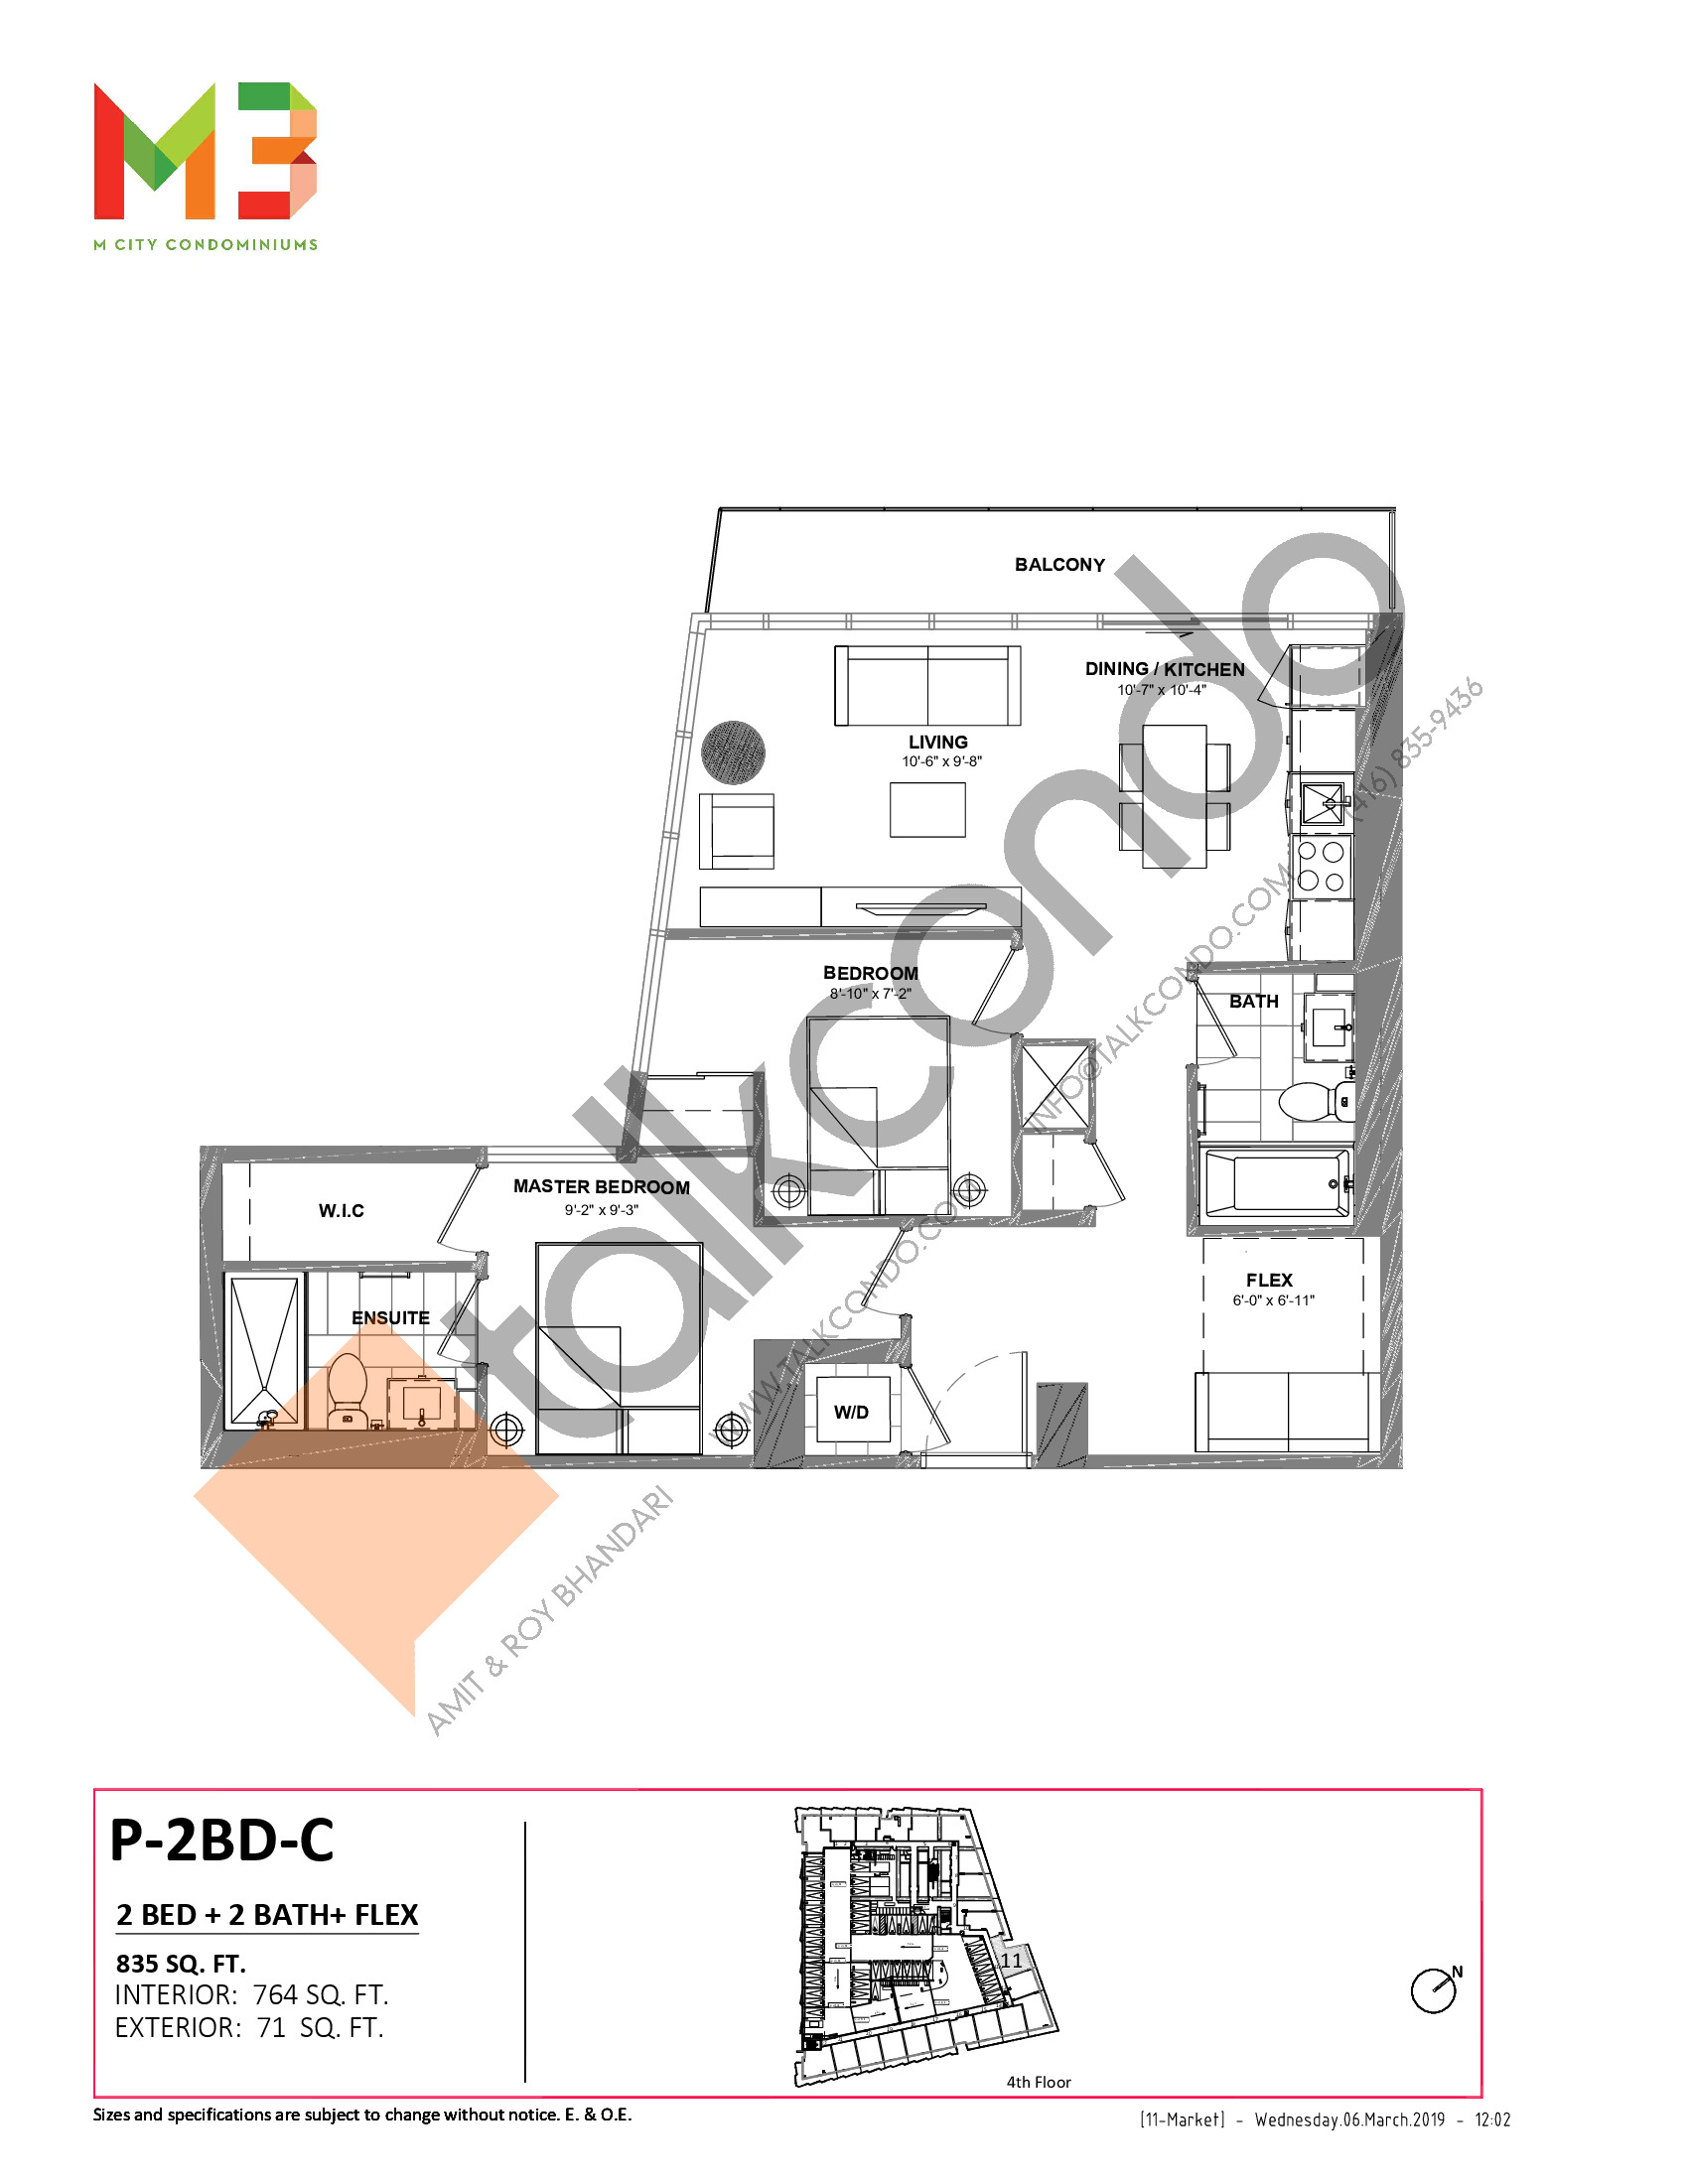 P-2BD-C Floor Plan at M3 Condos - 764 sq.ft